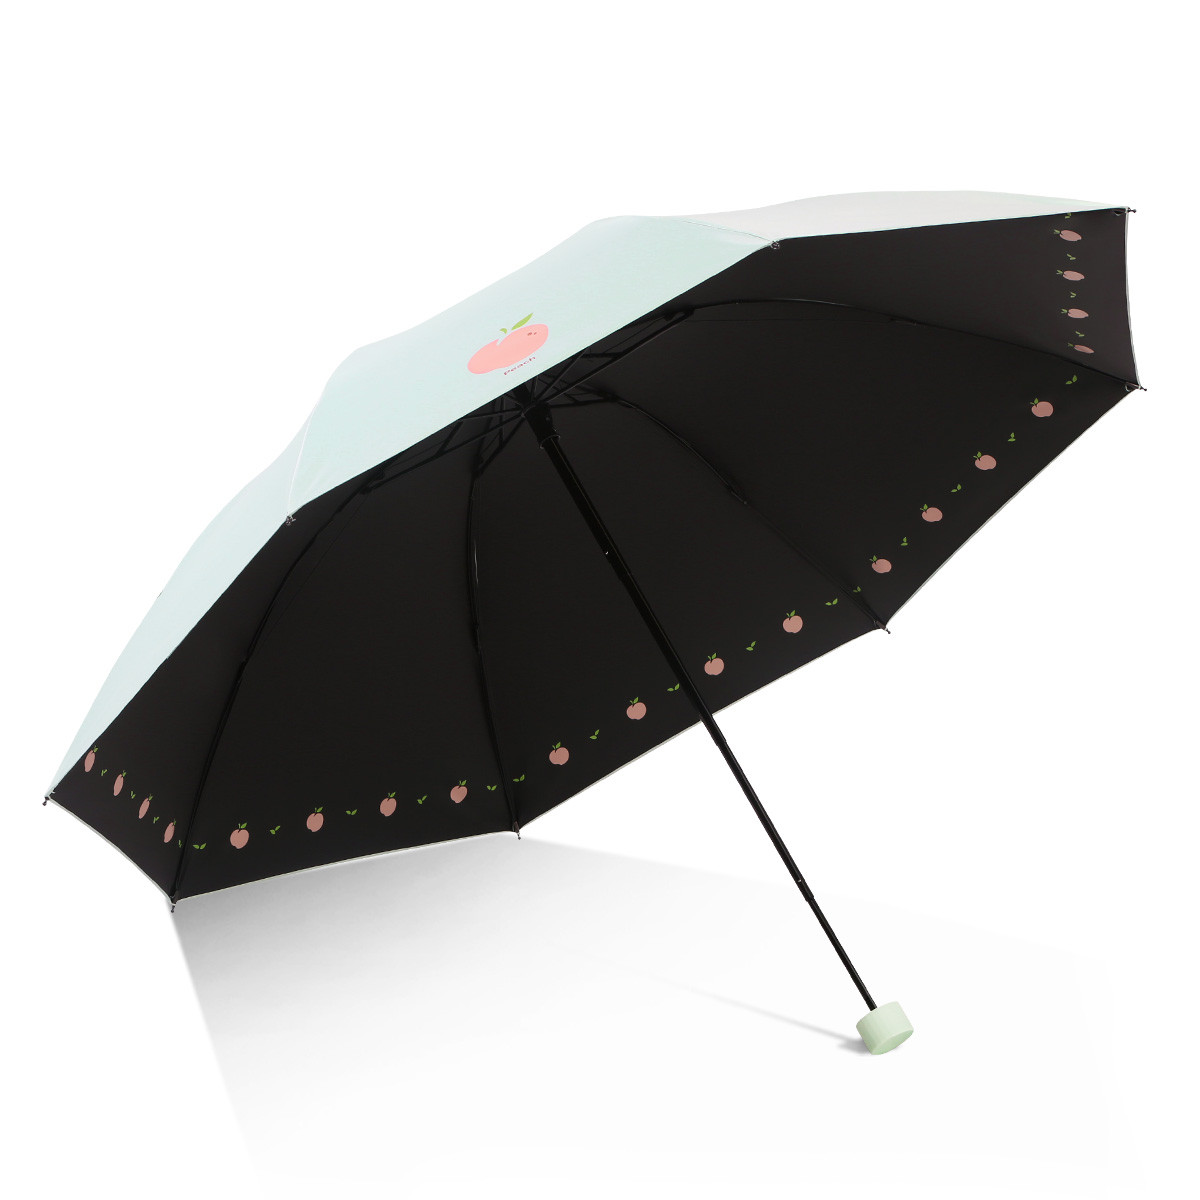 Paradise 天堂伞 便携晴雨两用伞